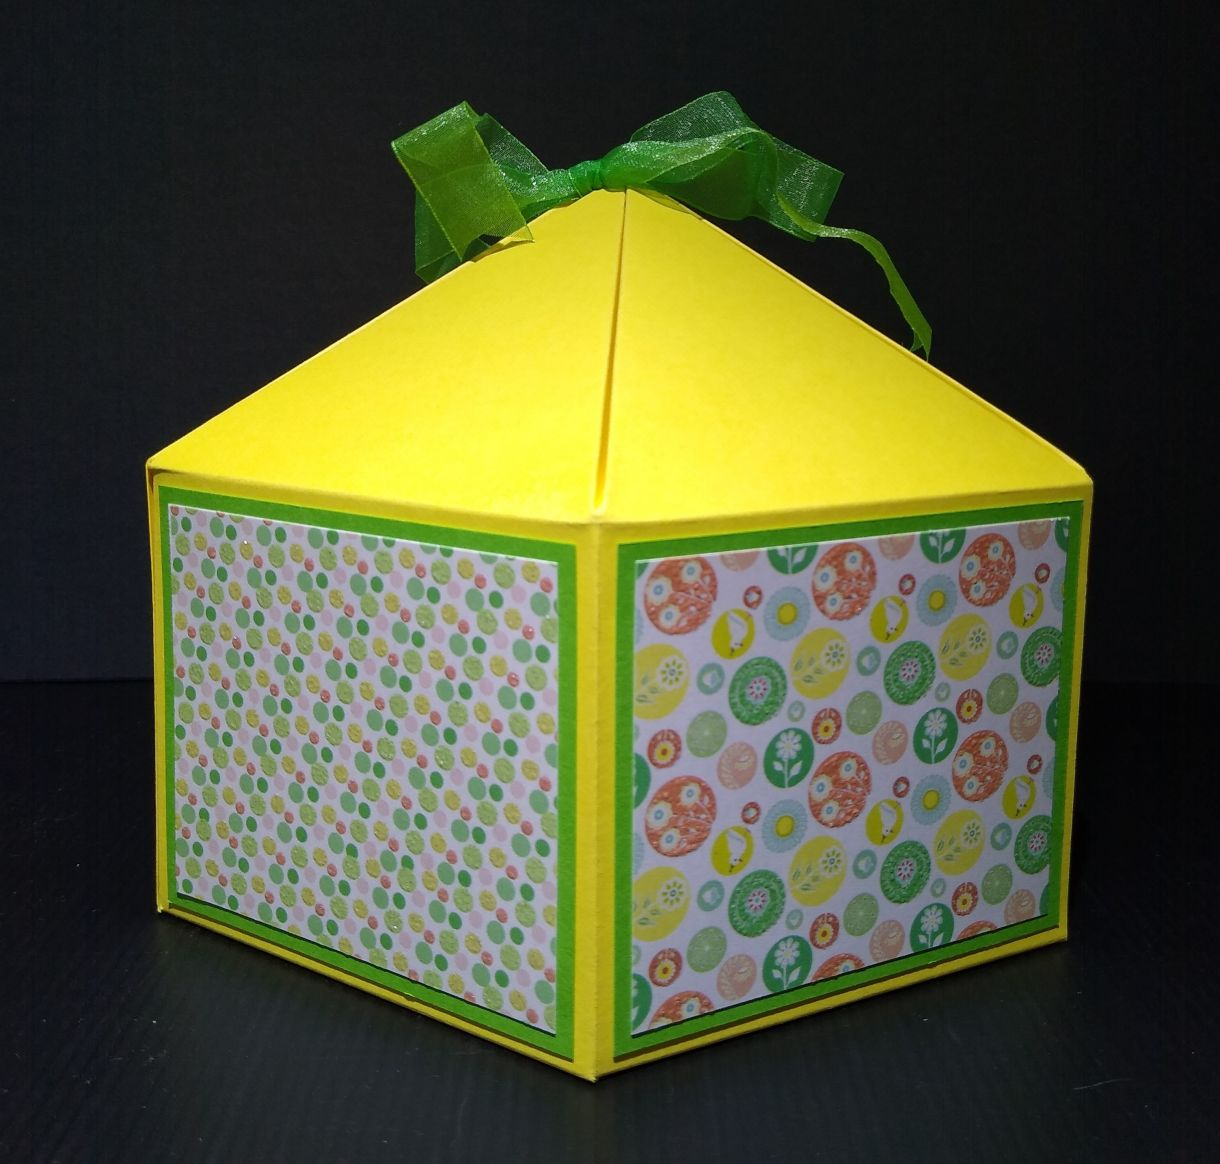 Large Squat Hexagonal Gift Box 2